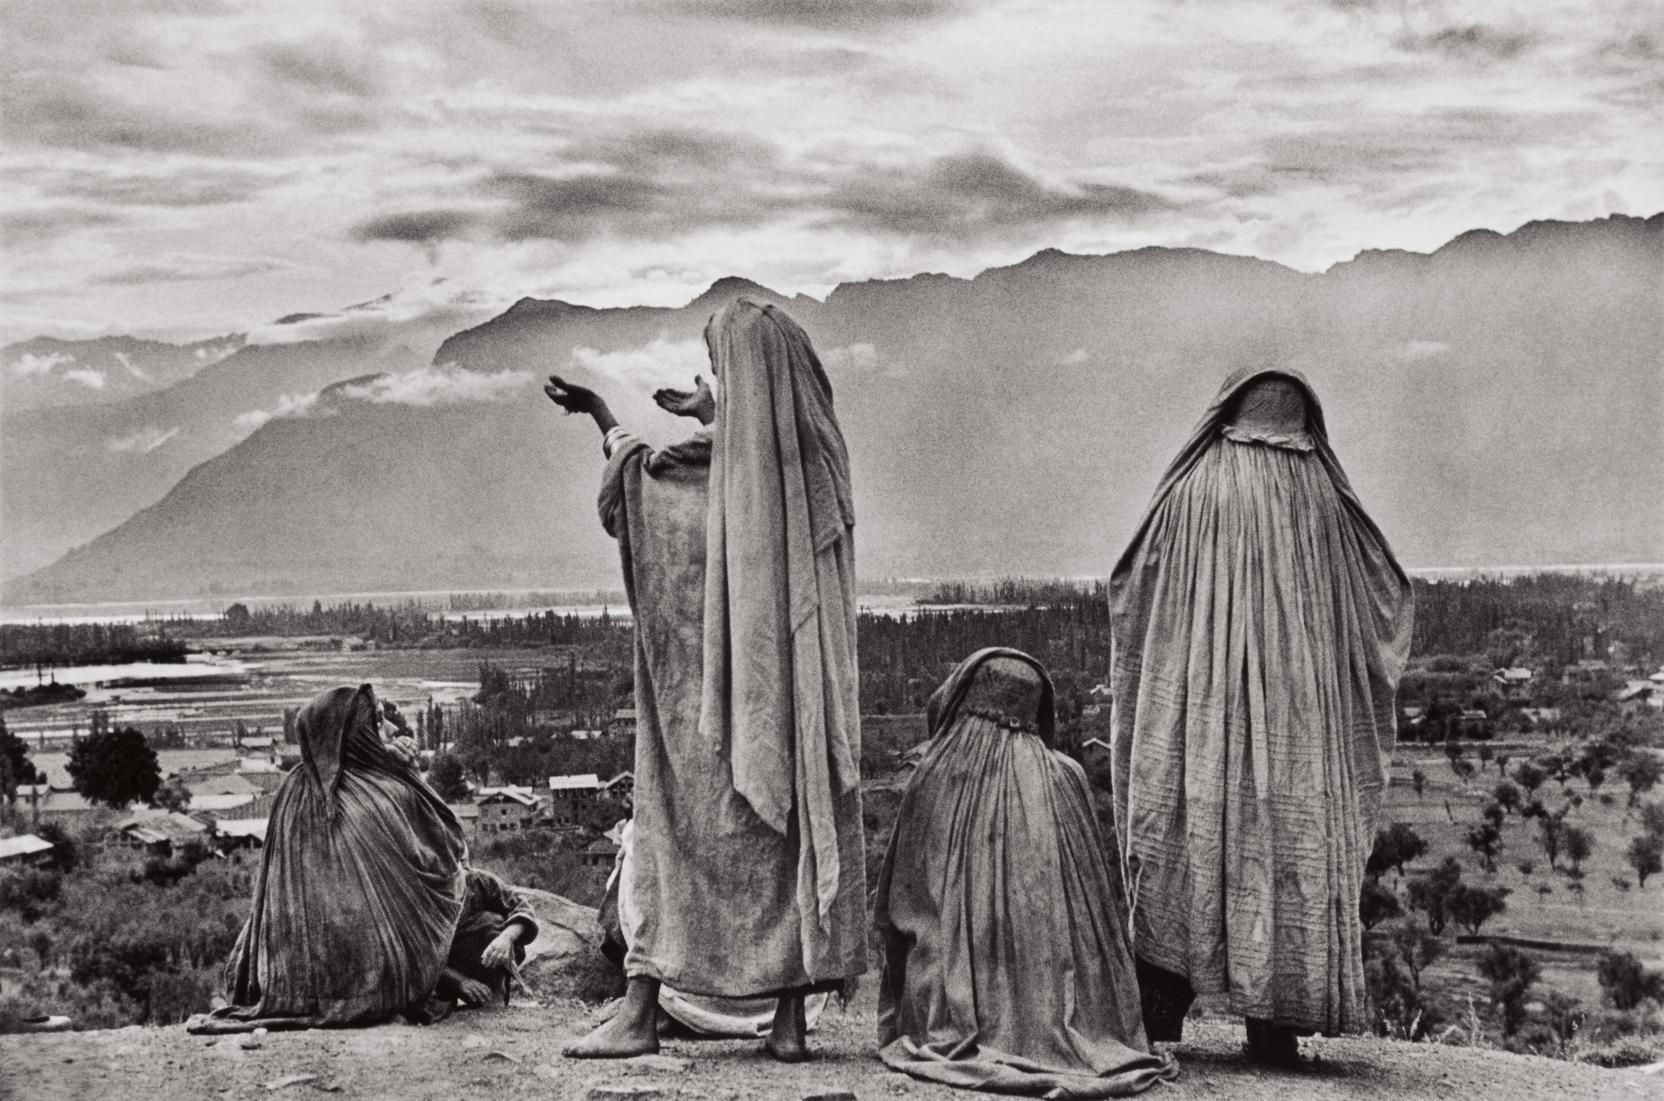 Henri Cartier-Bresson-Srinagar, Kashmir-1948